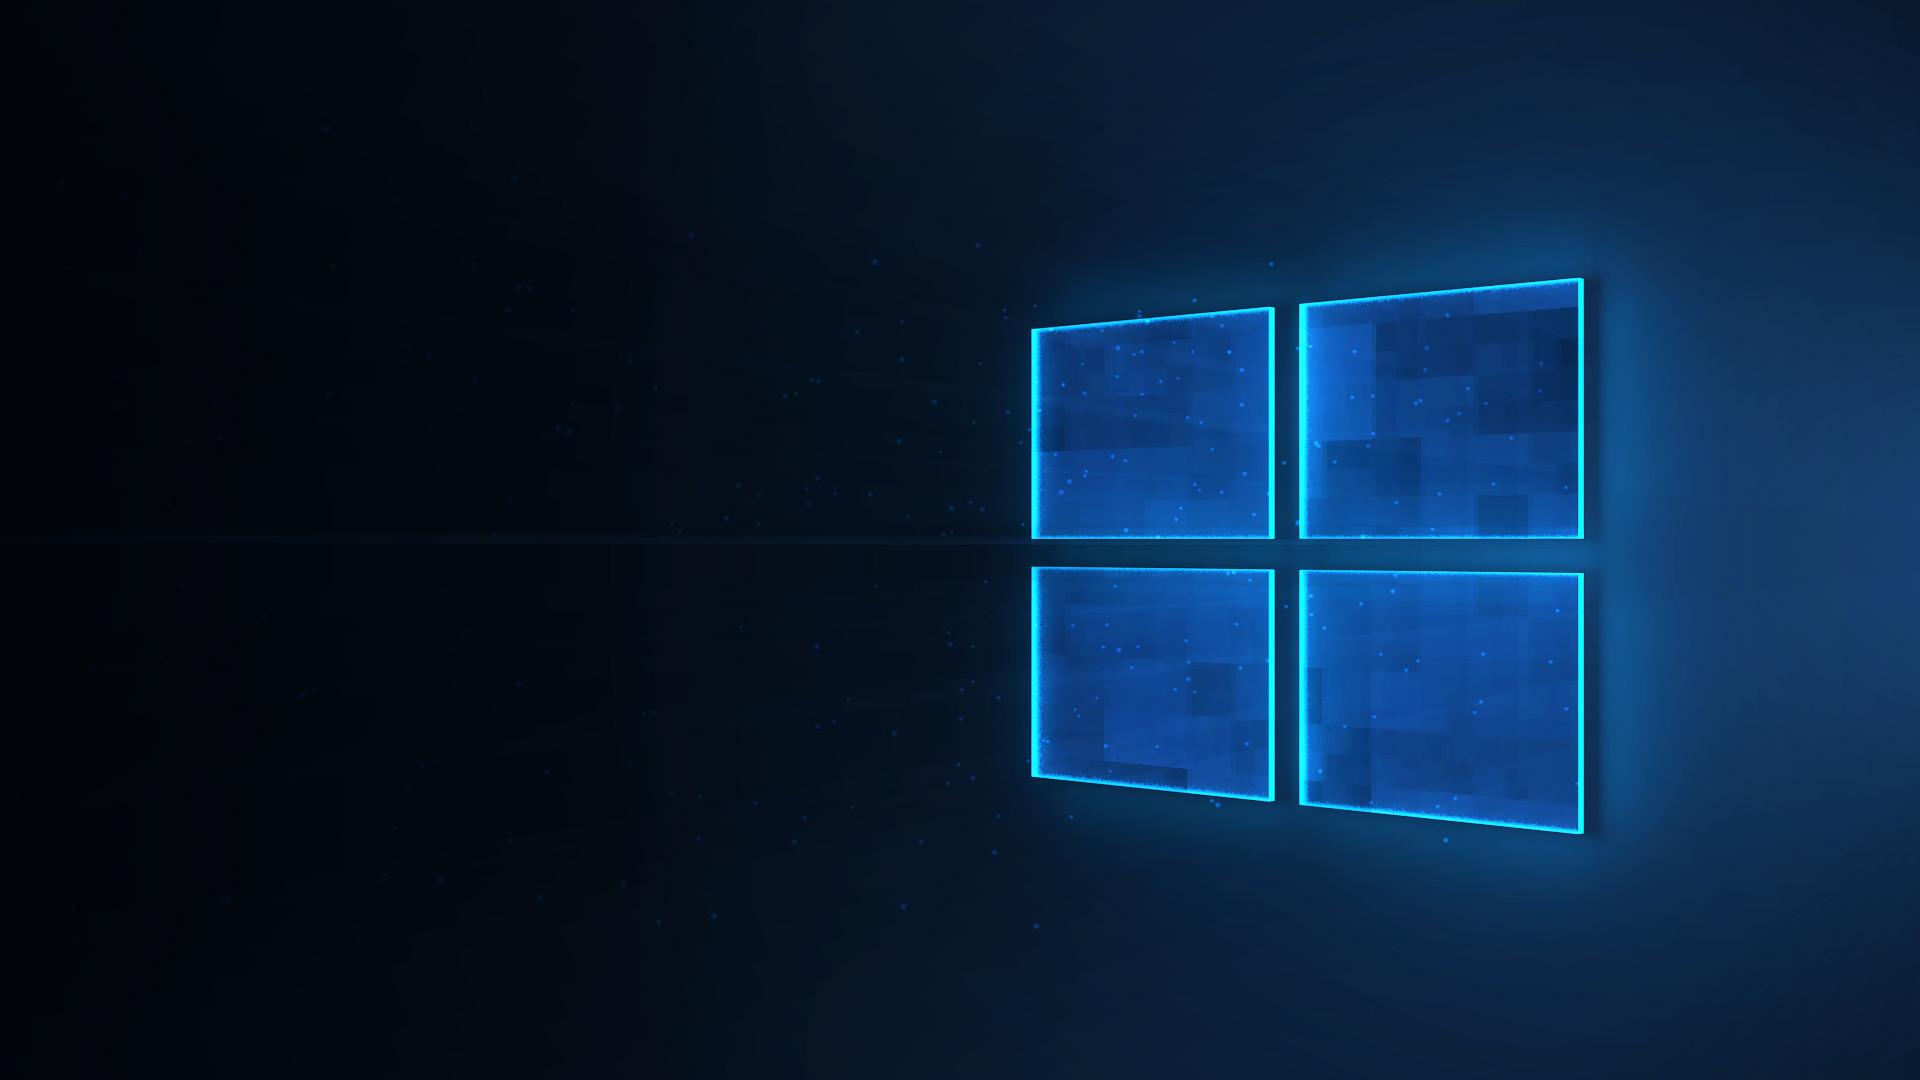 Windows 10 Black Wallpaper (67+ Images